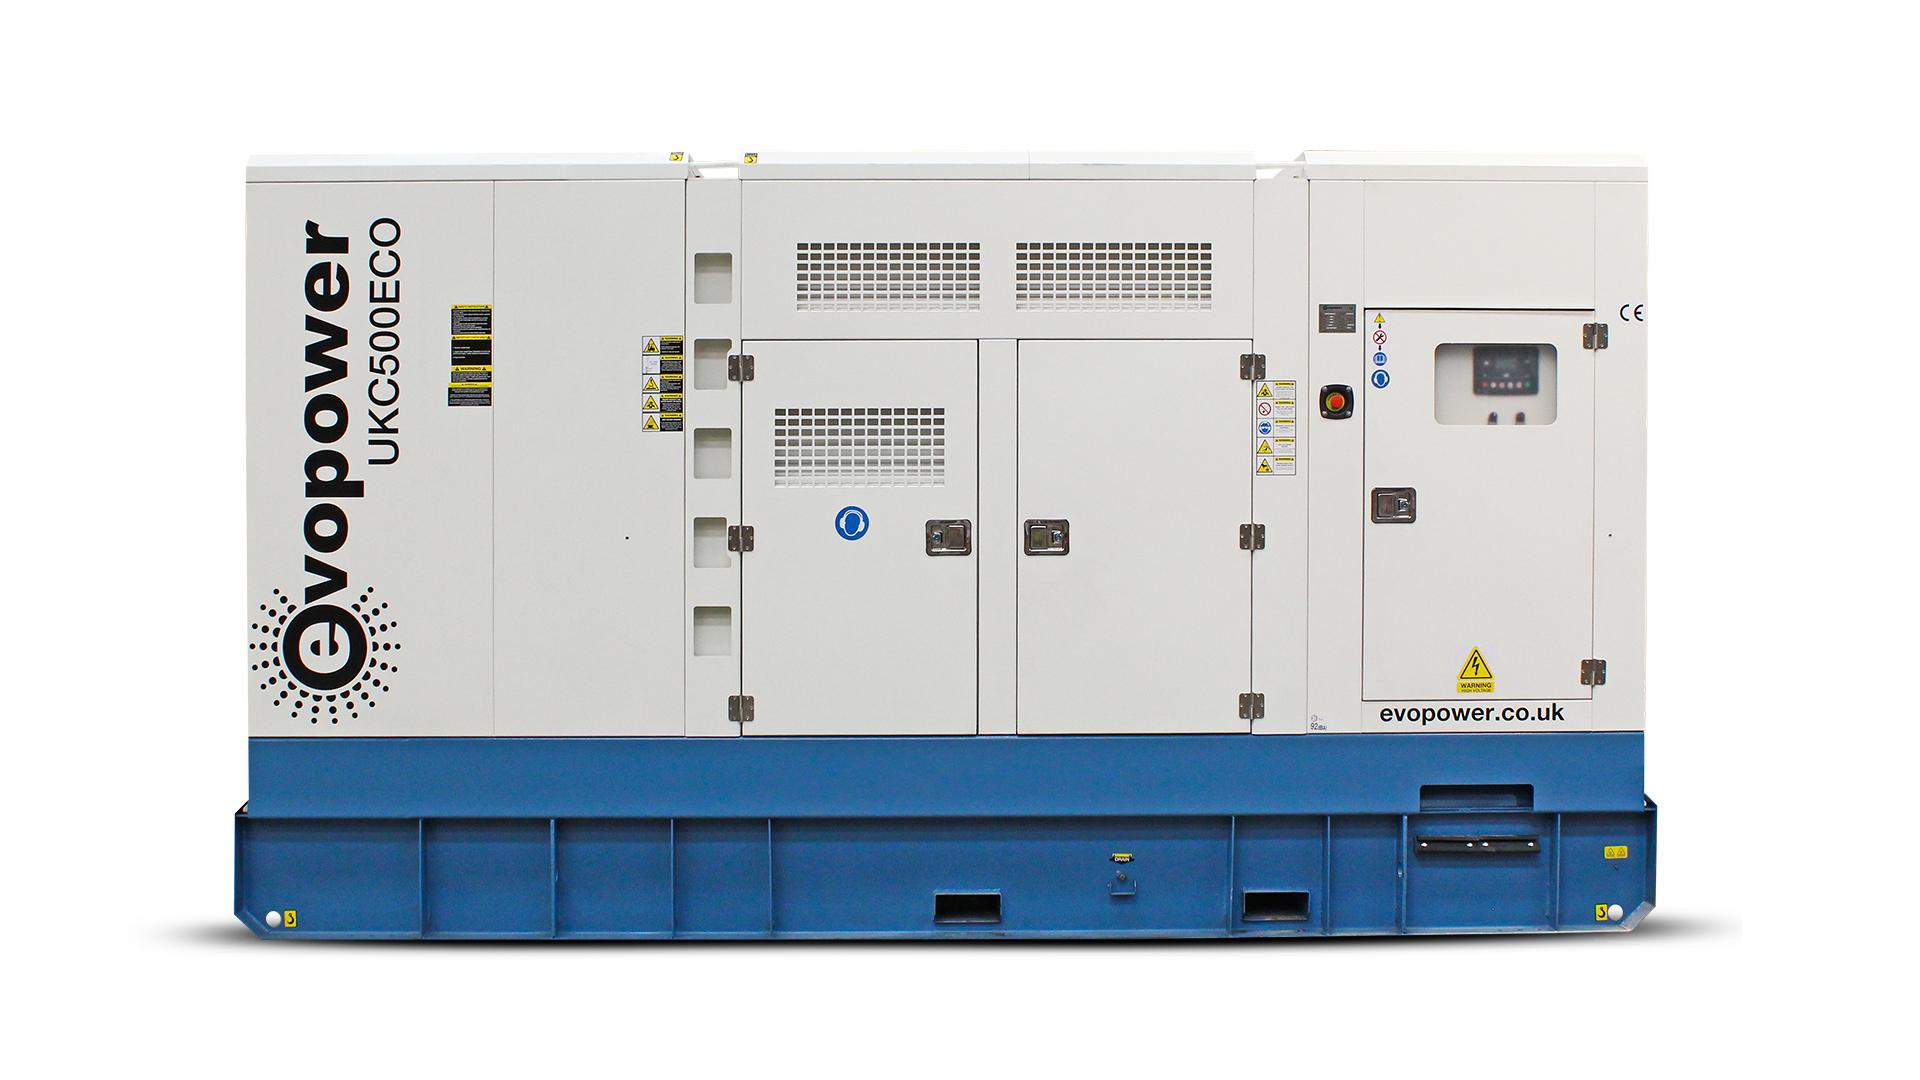 UKC500ECO 500kVA Generator front view